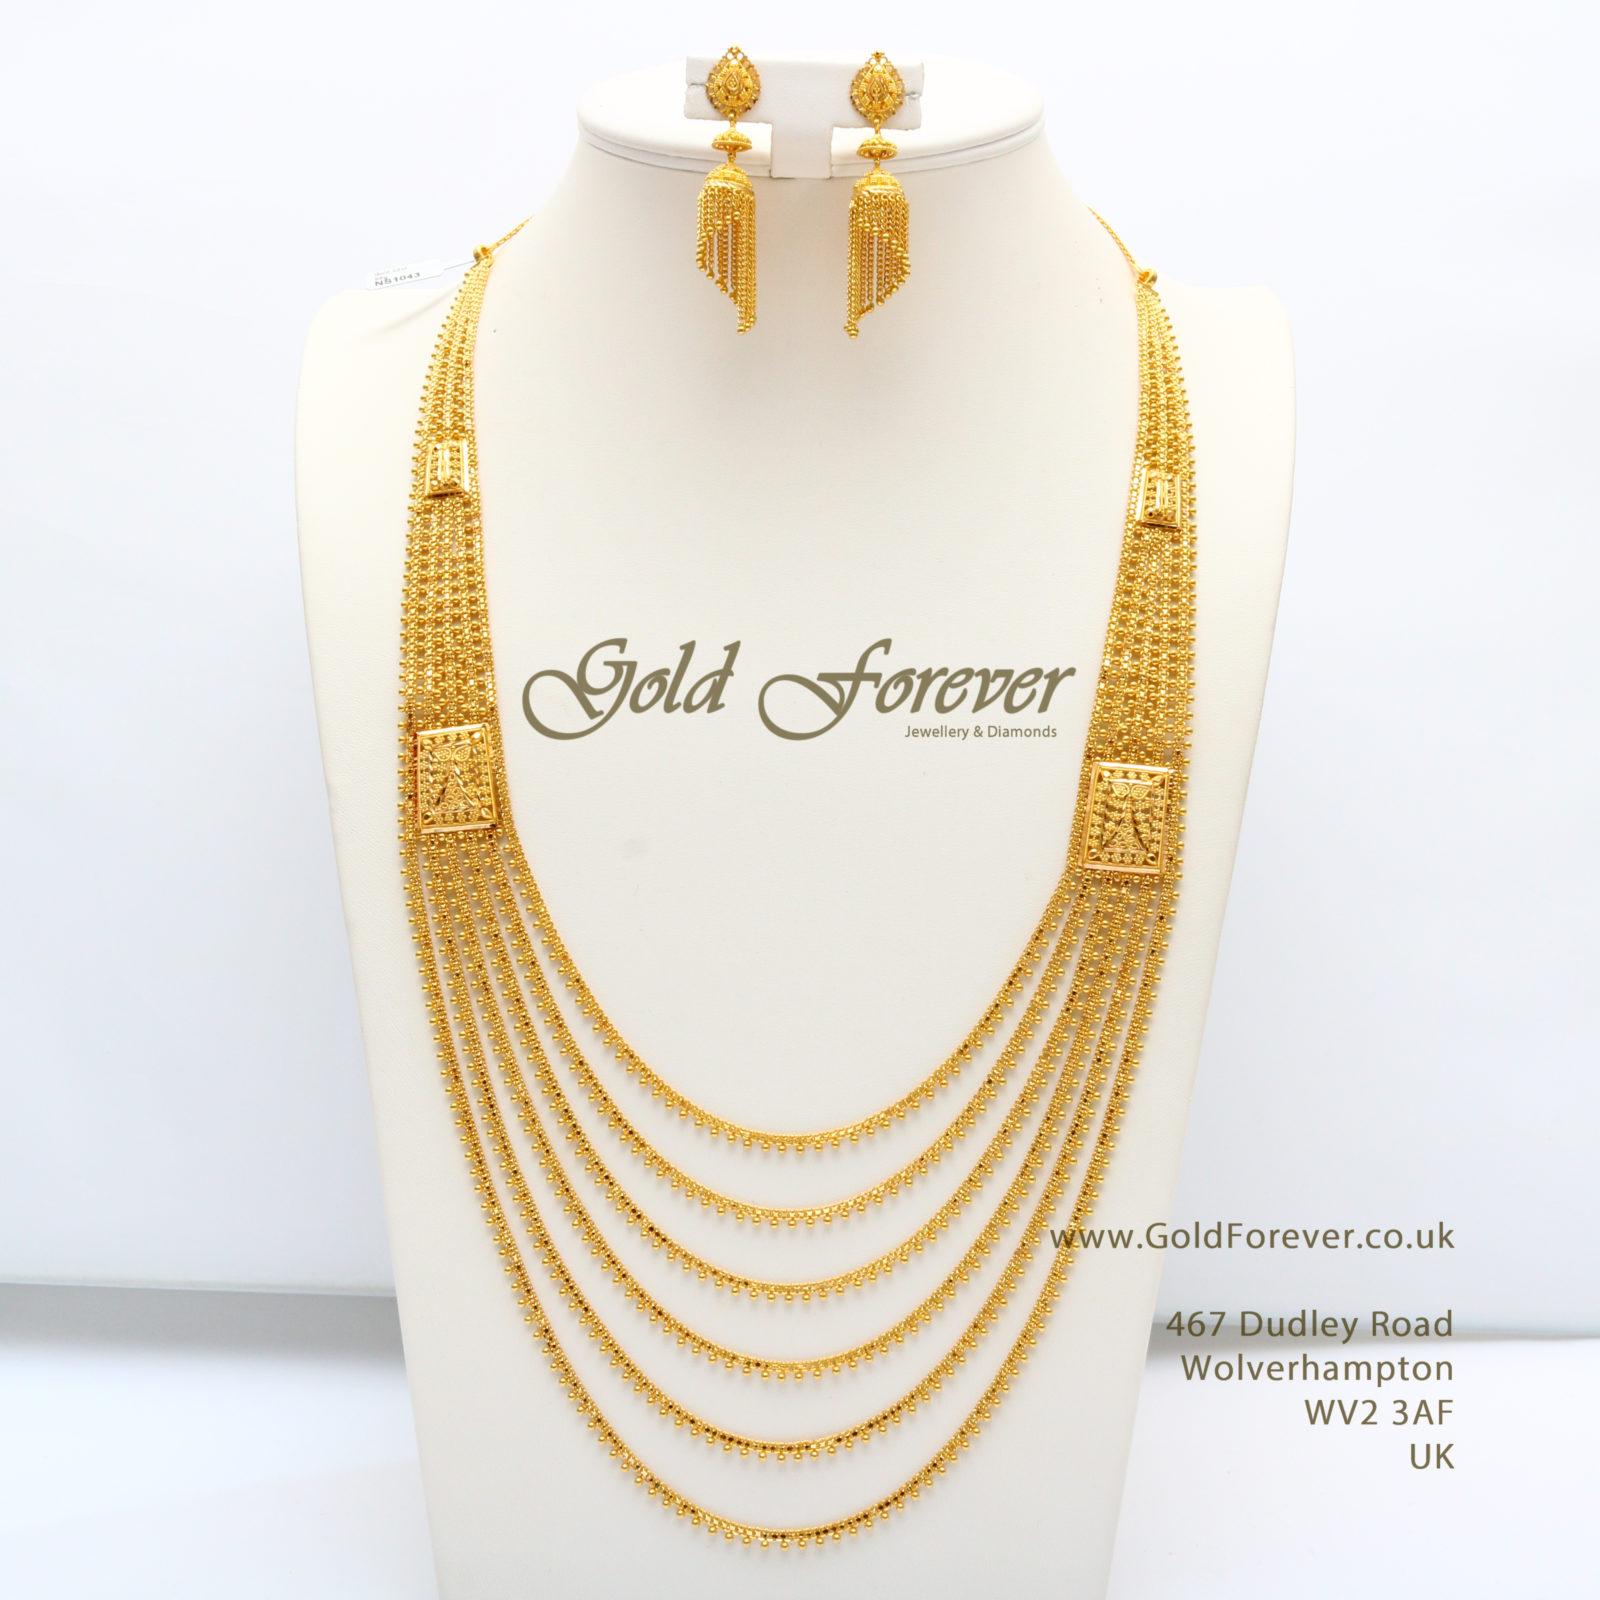 22 Carat Indian Gold Necklace Set 85 Grams Code Ns1043 Gold Forever